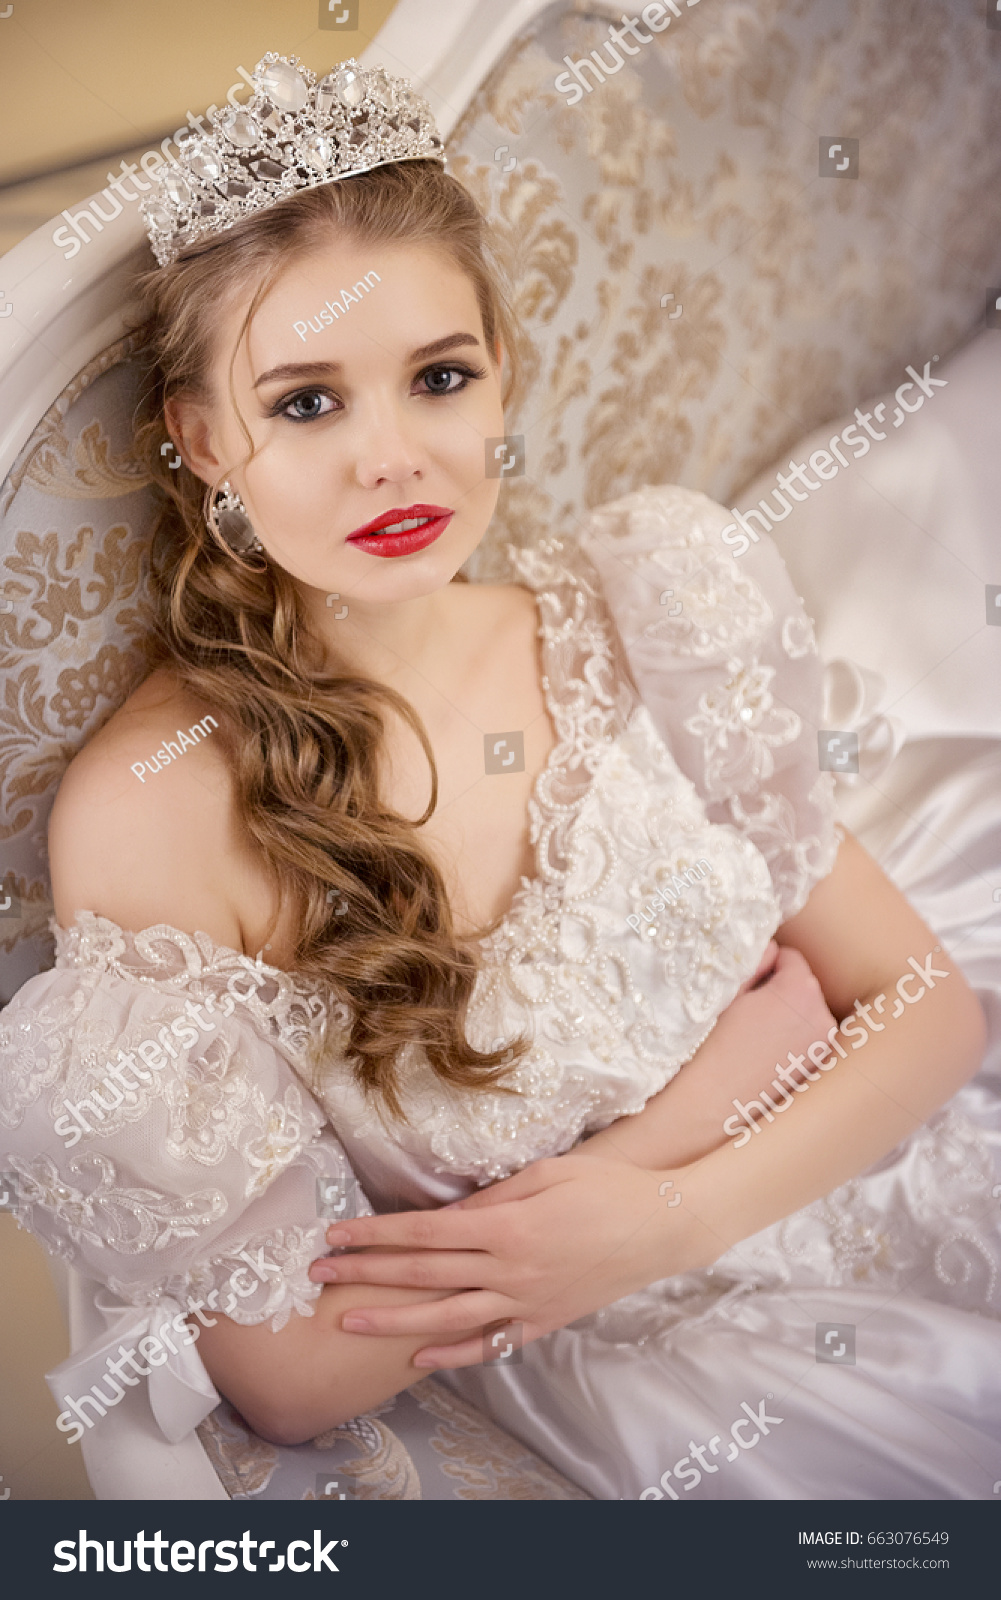 Portrait Girl Wedding Dress Crown On Stock Photo (Royalty Free ...